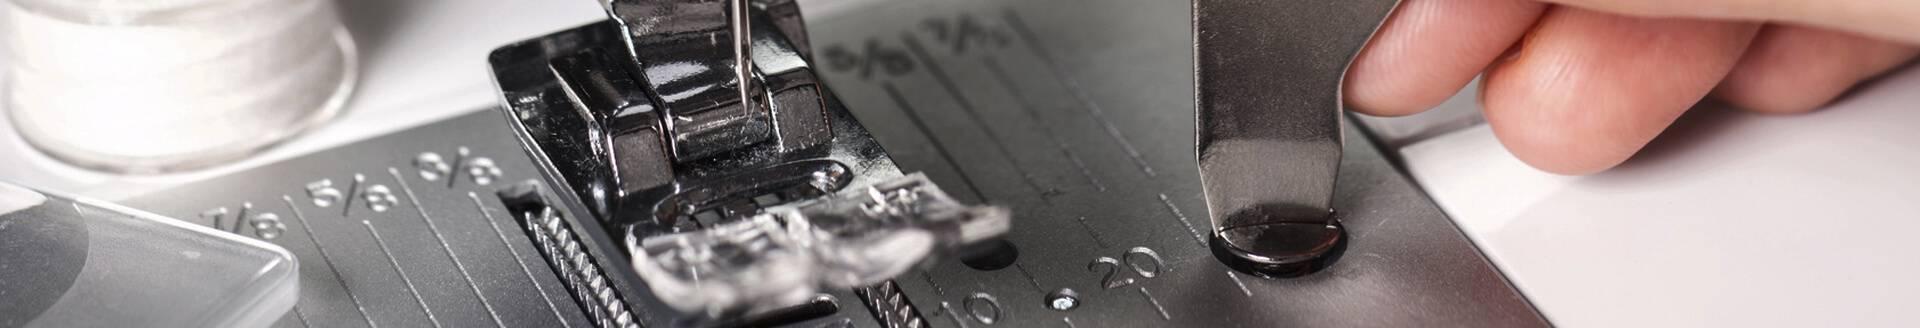 Venta de prensatelas de caña alta para máquinas de coser domésticas